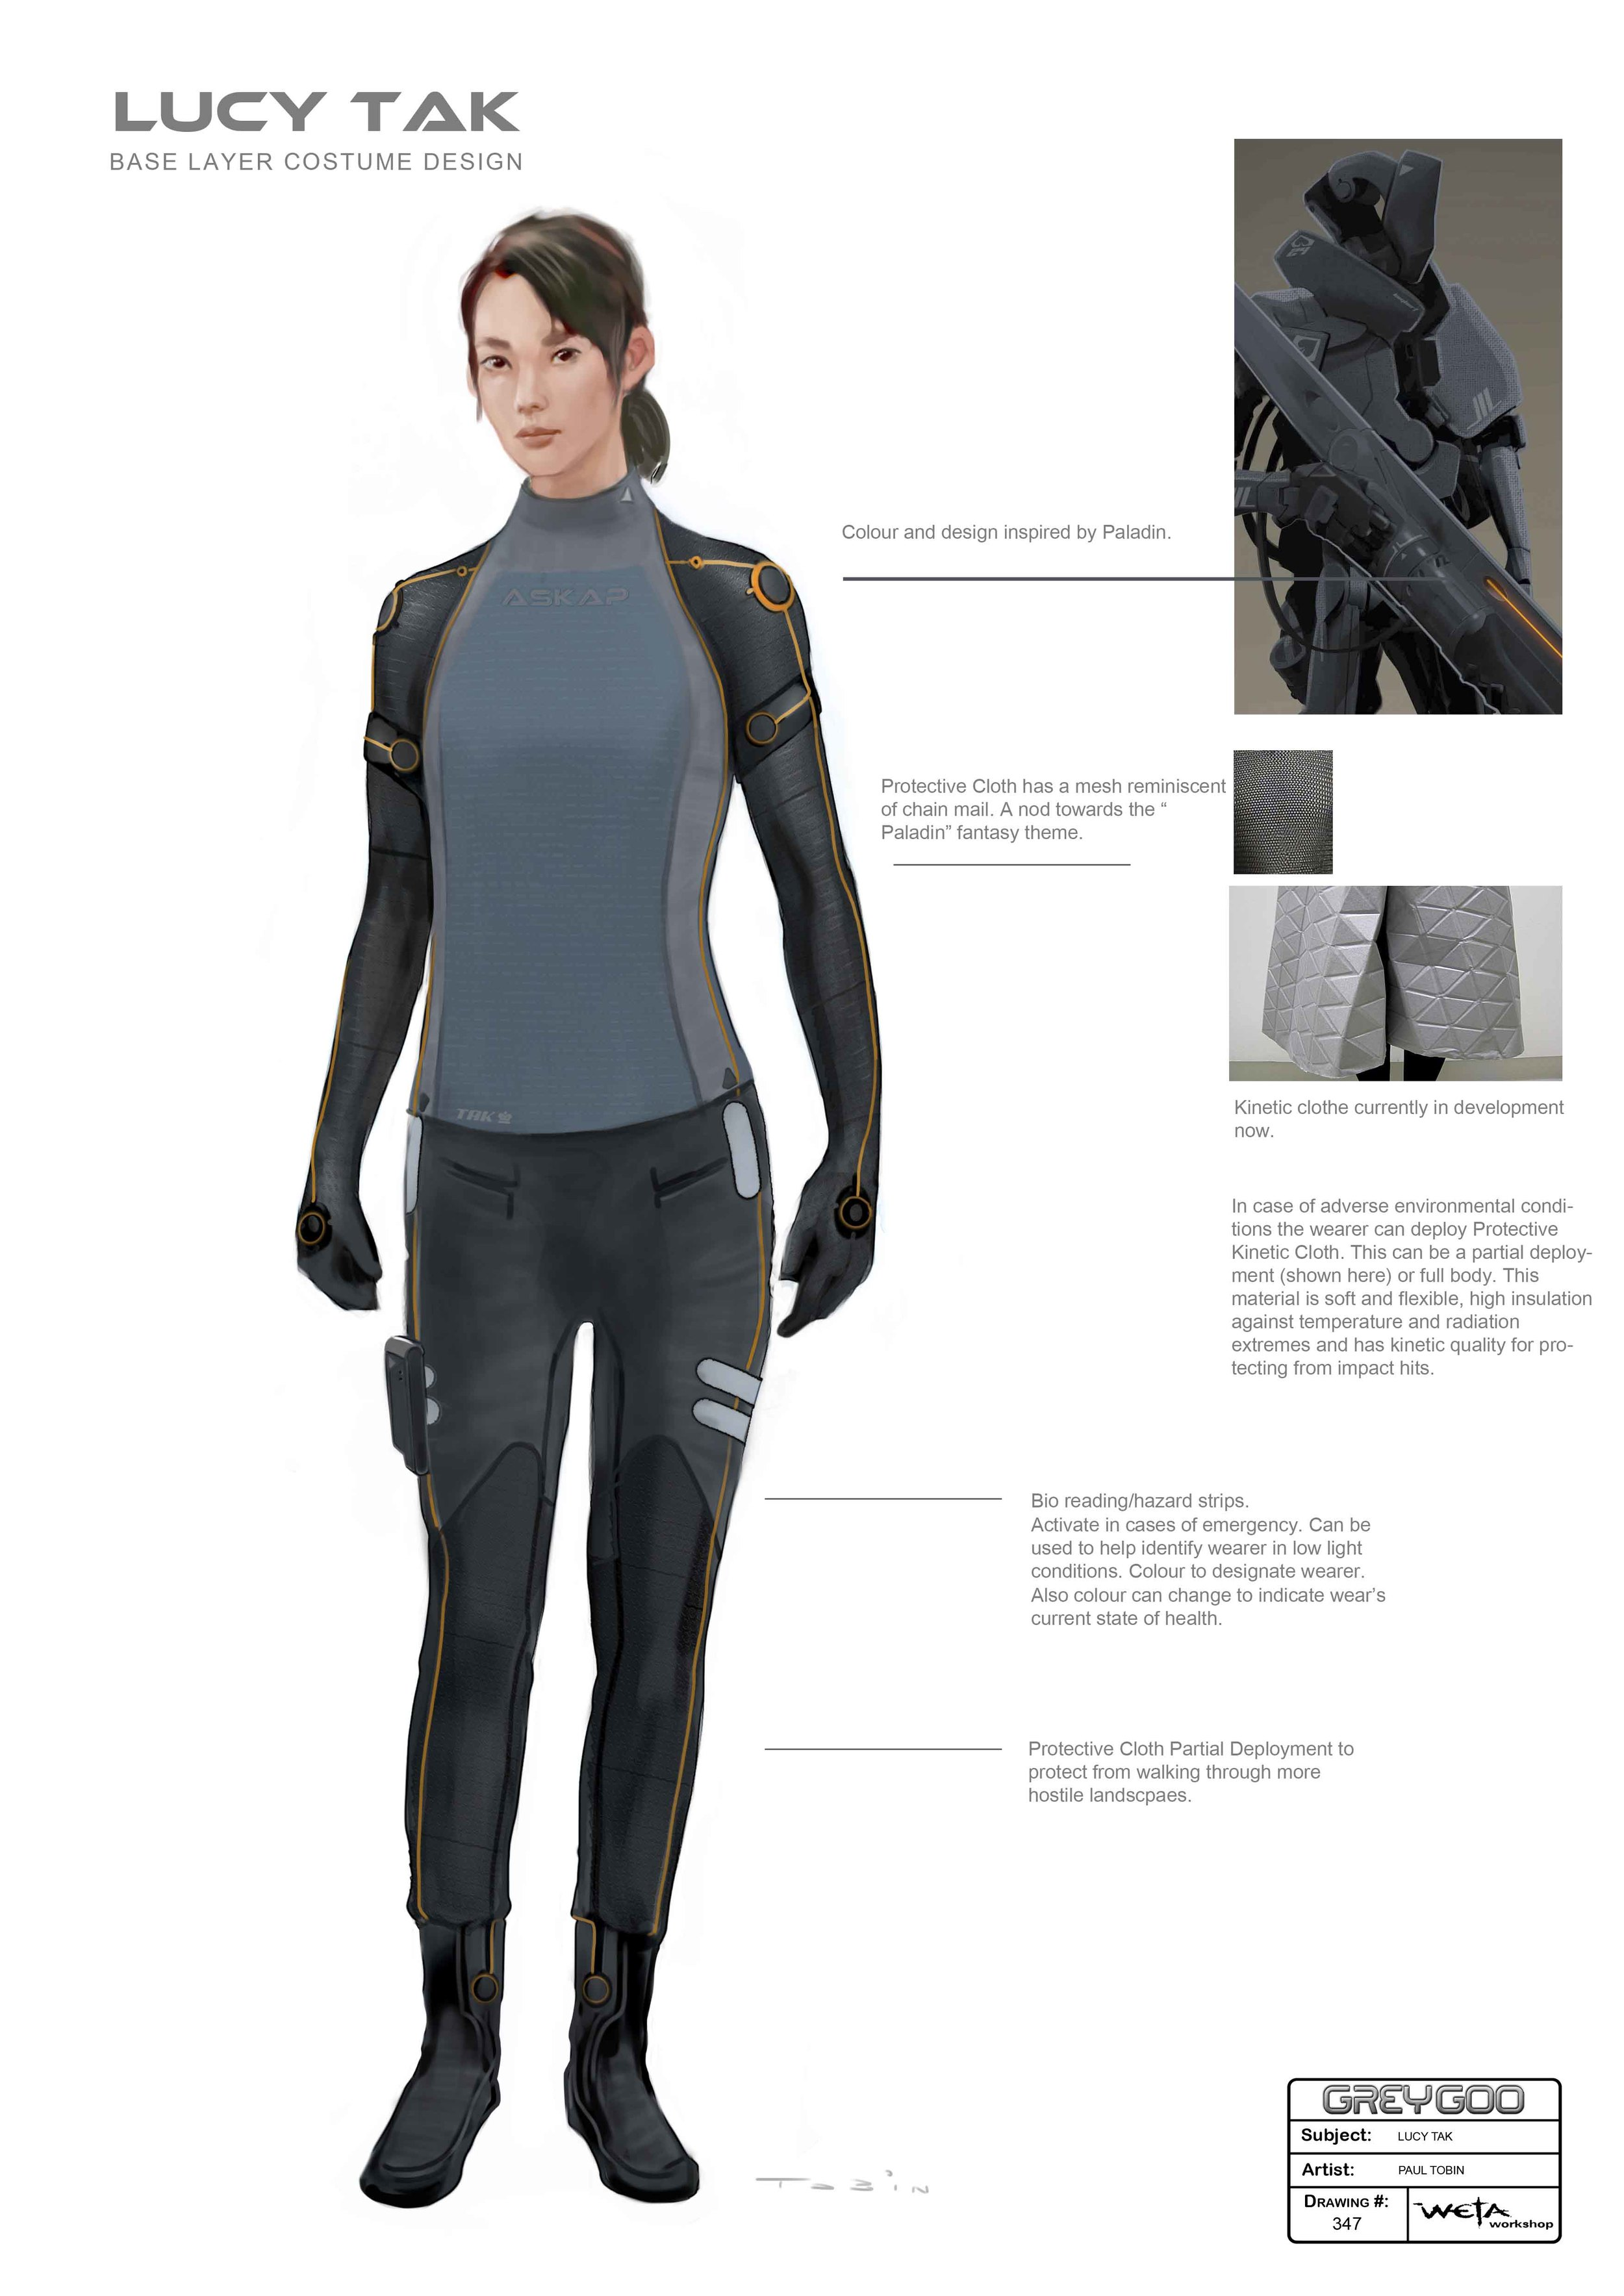 Lucy Tak Costume Design.jpg